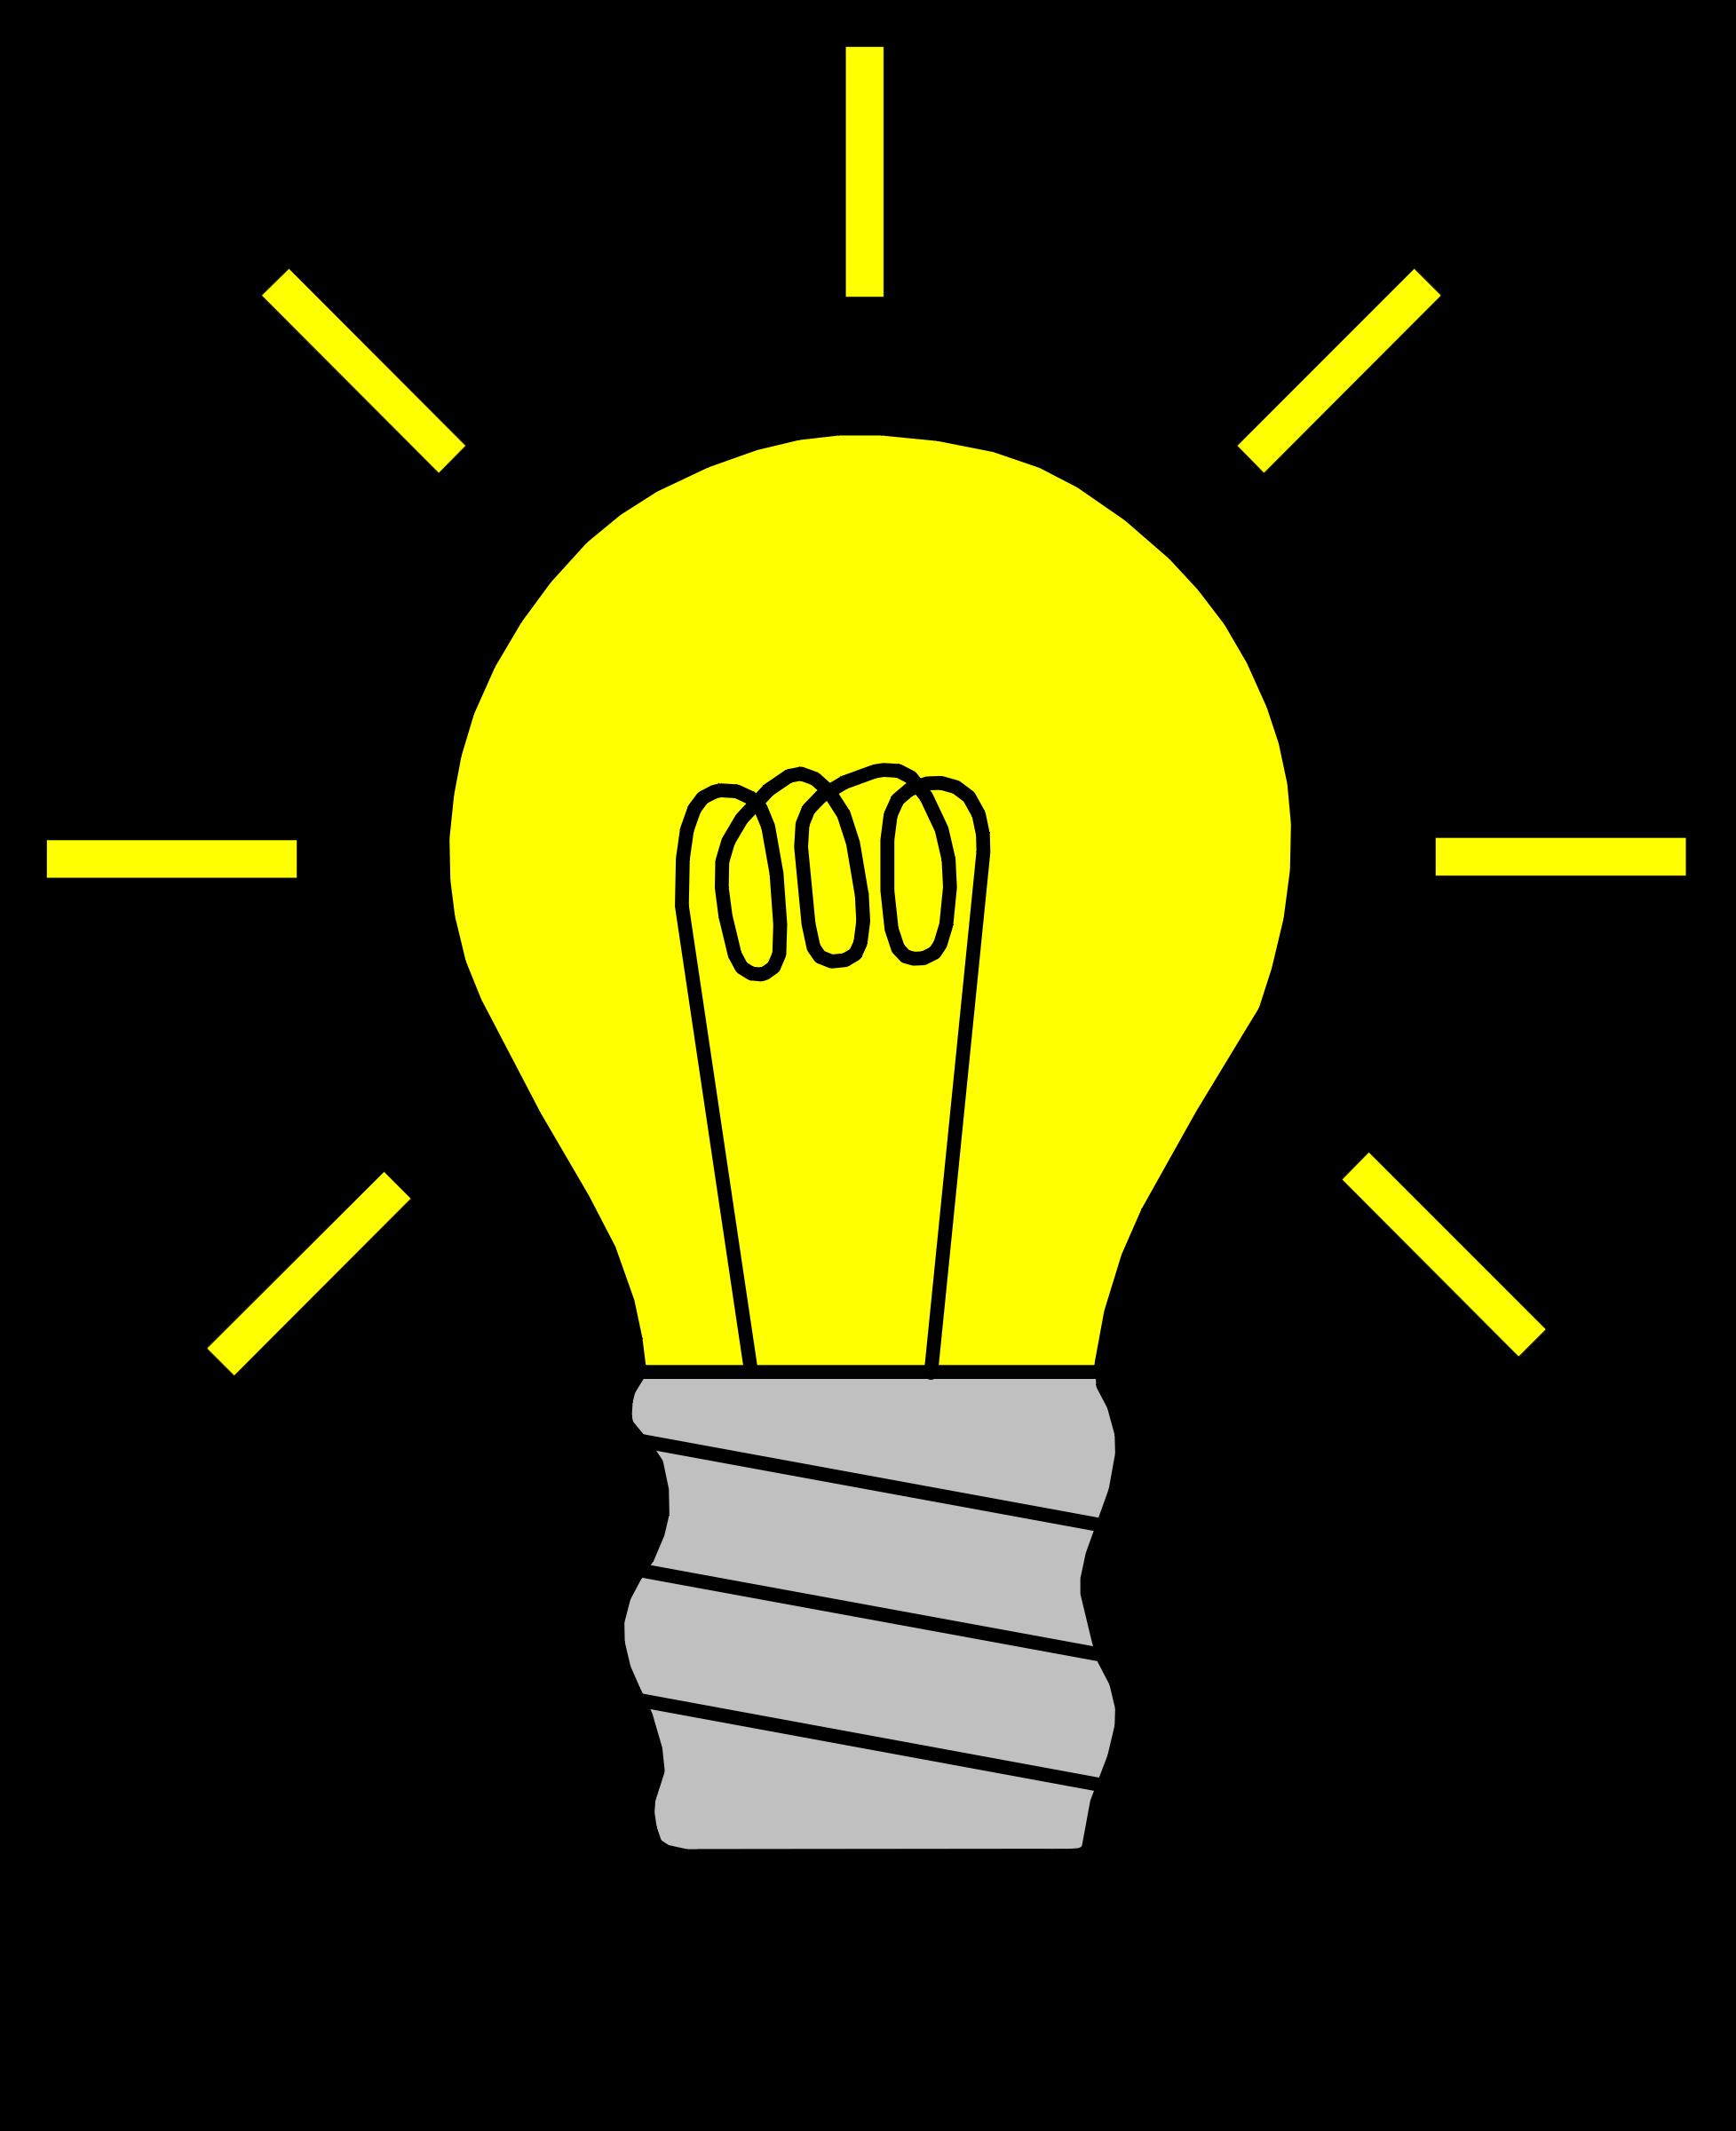 Light clipart Light Clipart Panda Clip Clipart